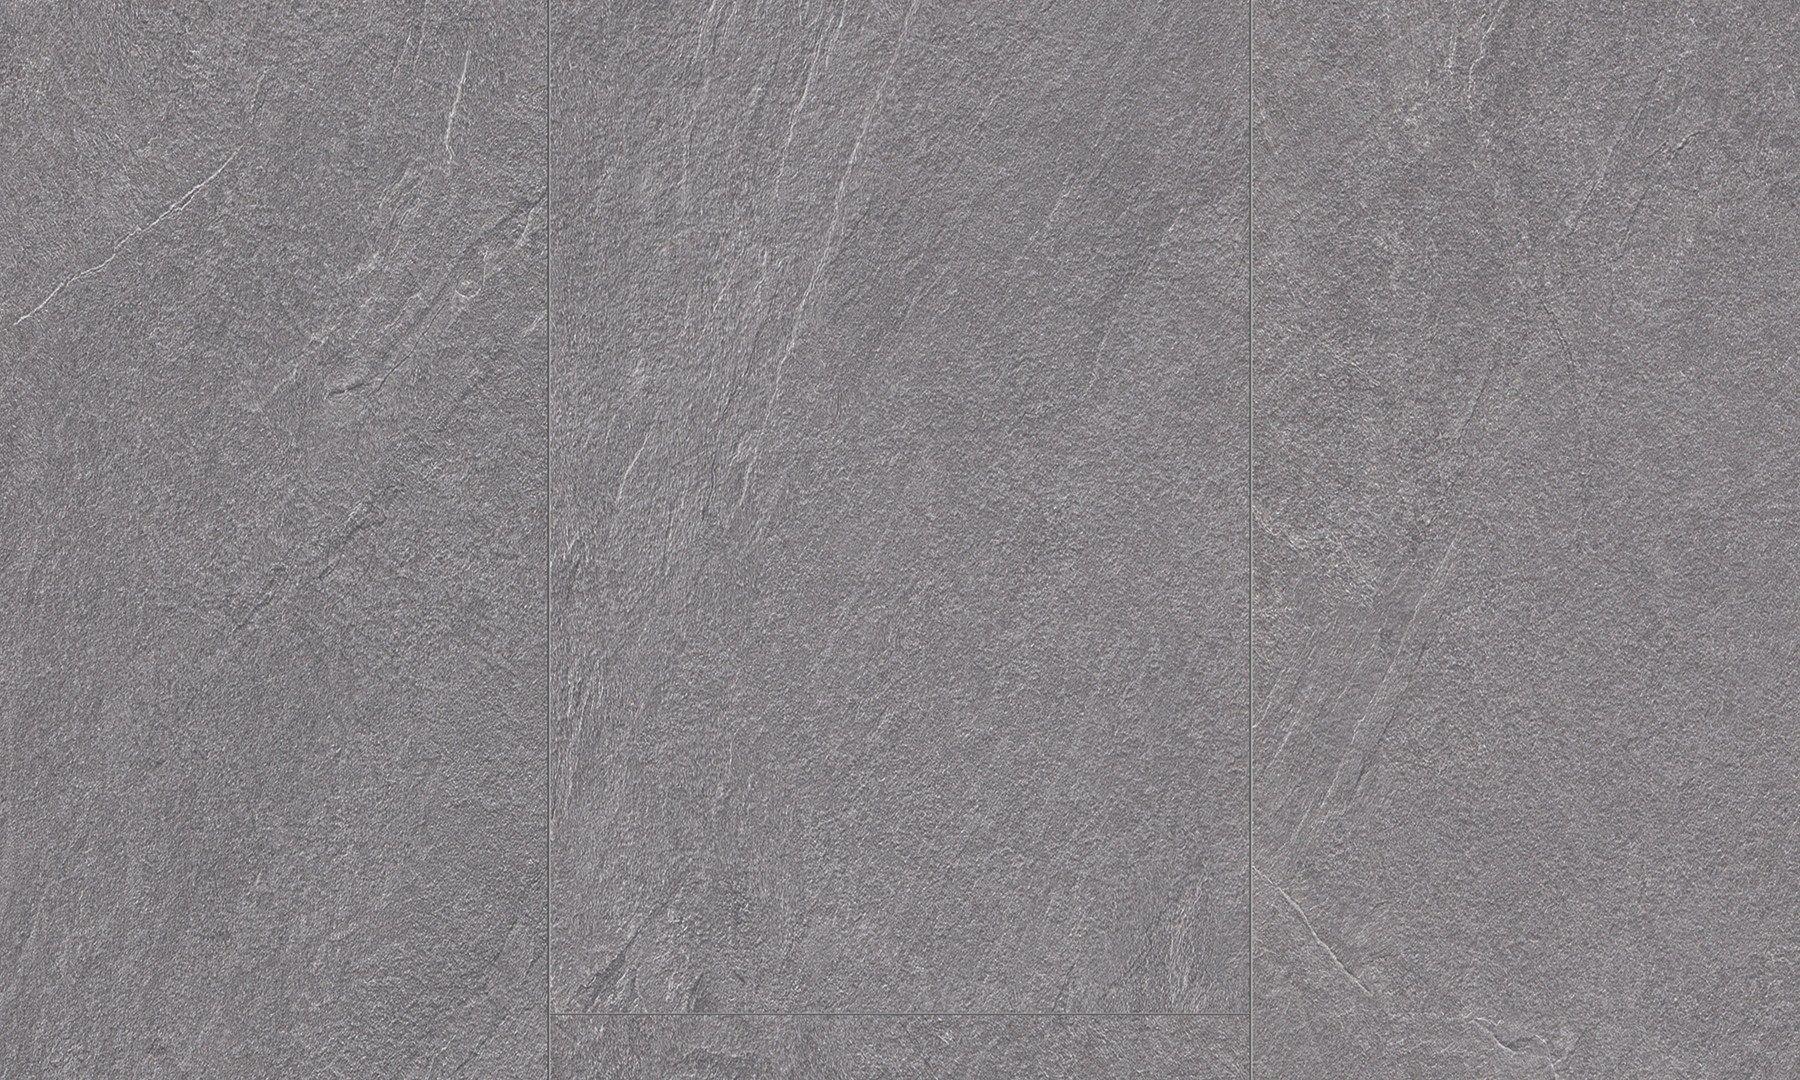 Pavimento 1800×1080 utility design pinterest slate